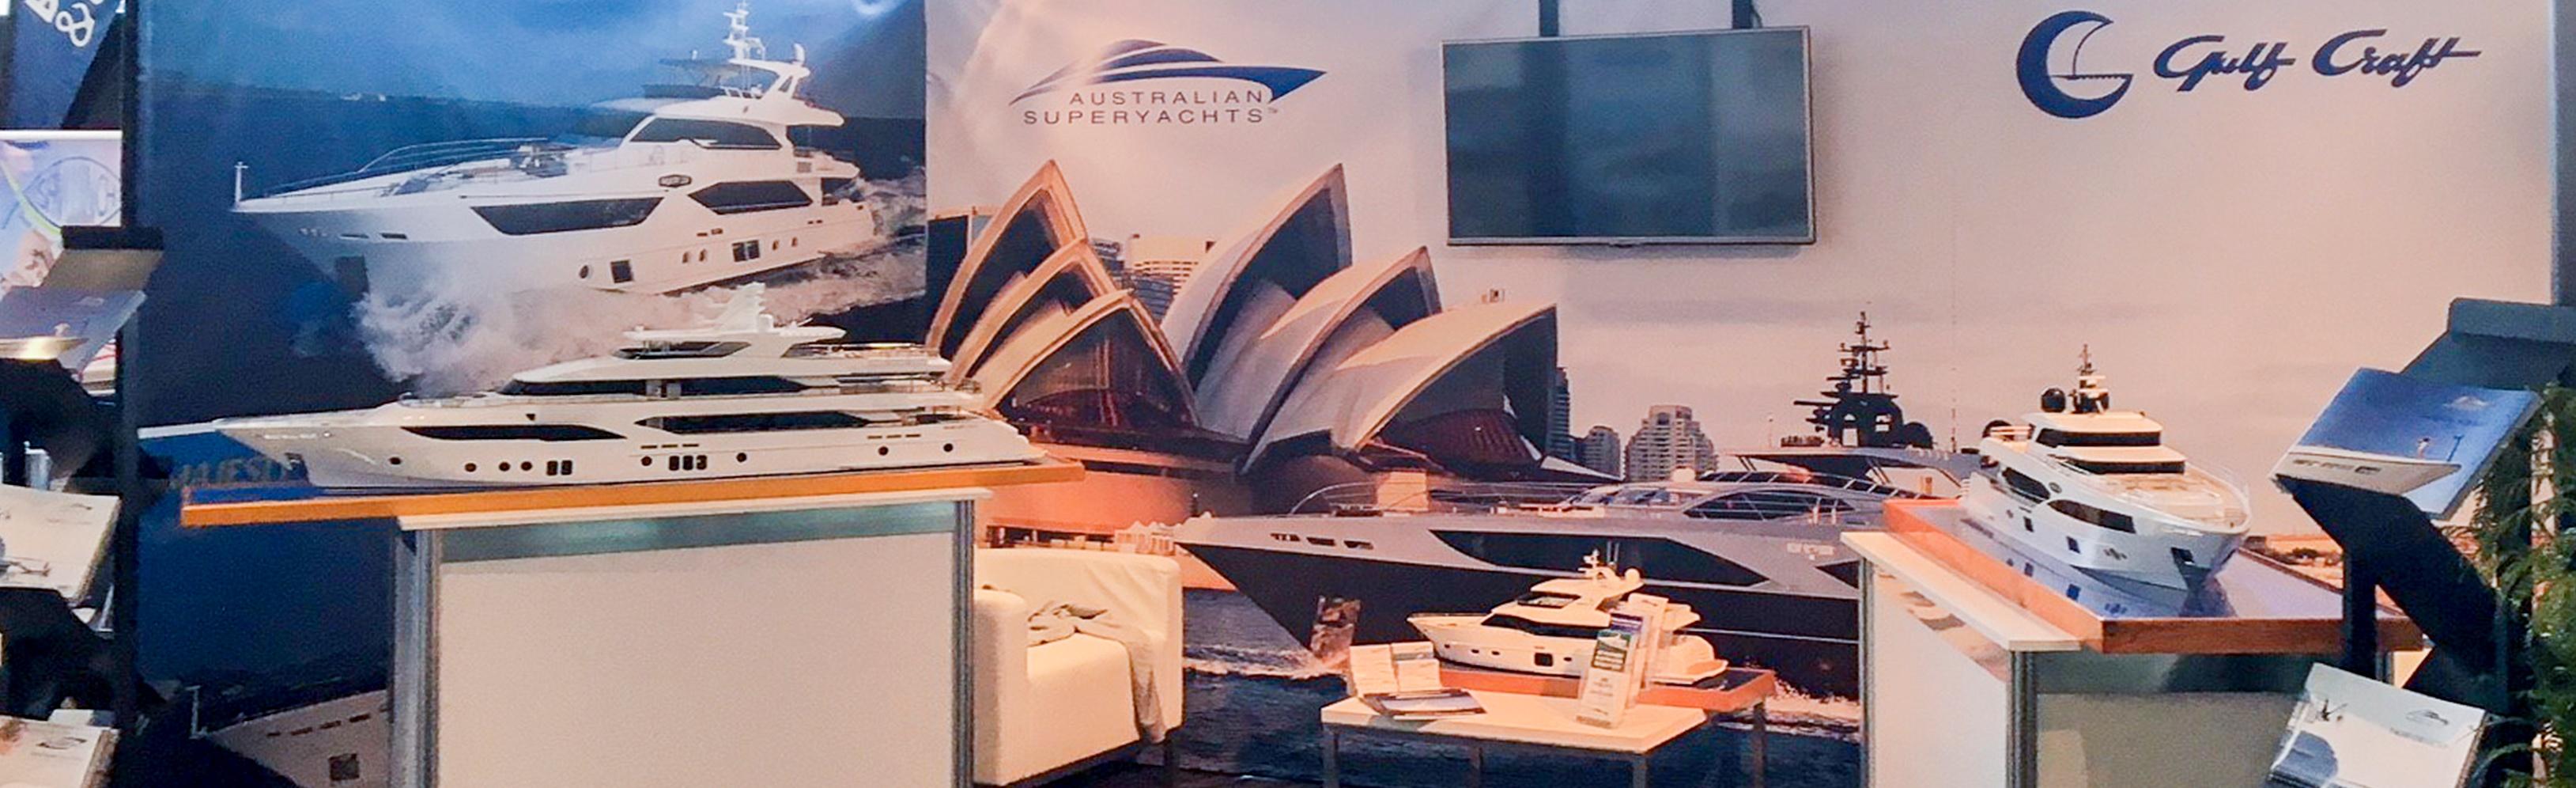 Gulf-Craft,-Auckland-Boat-Show-2017.jpg